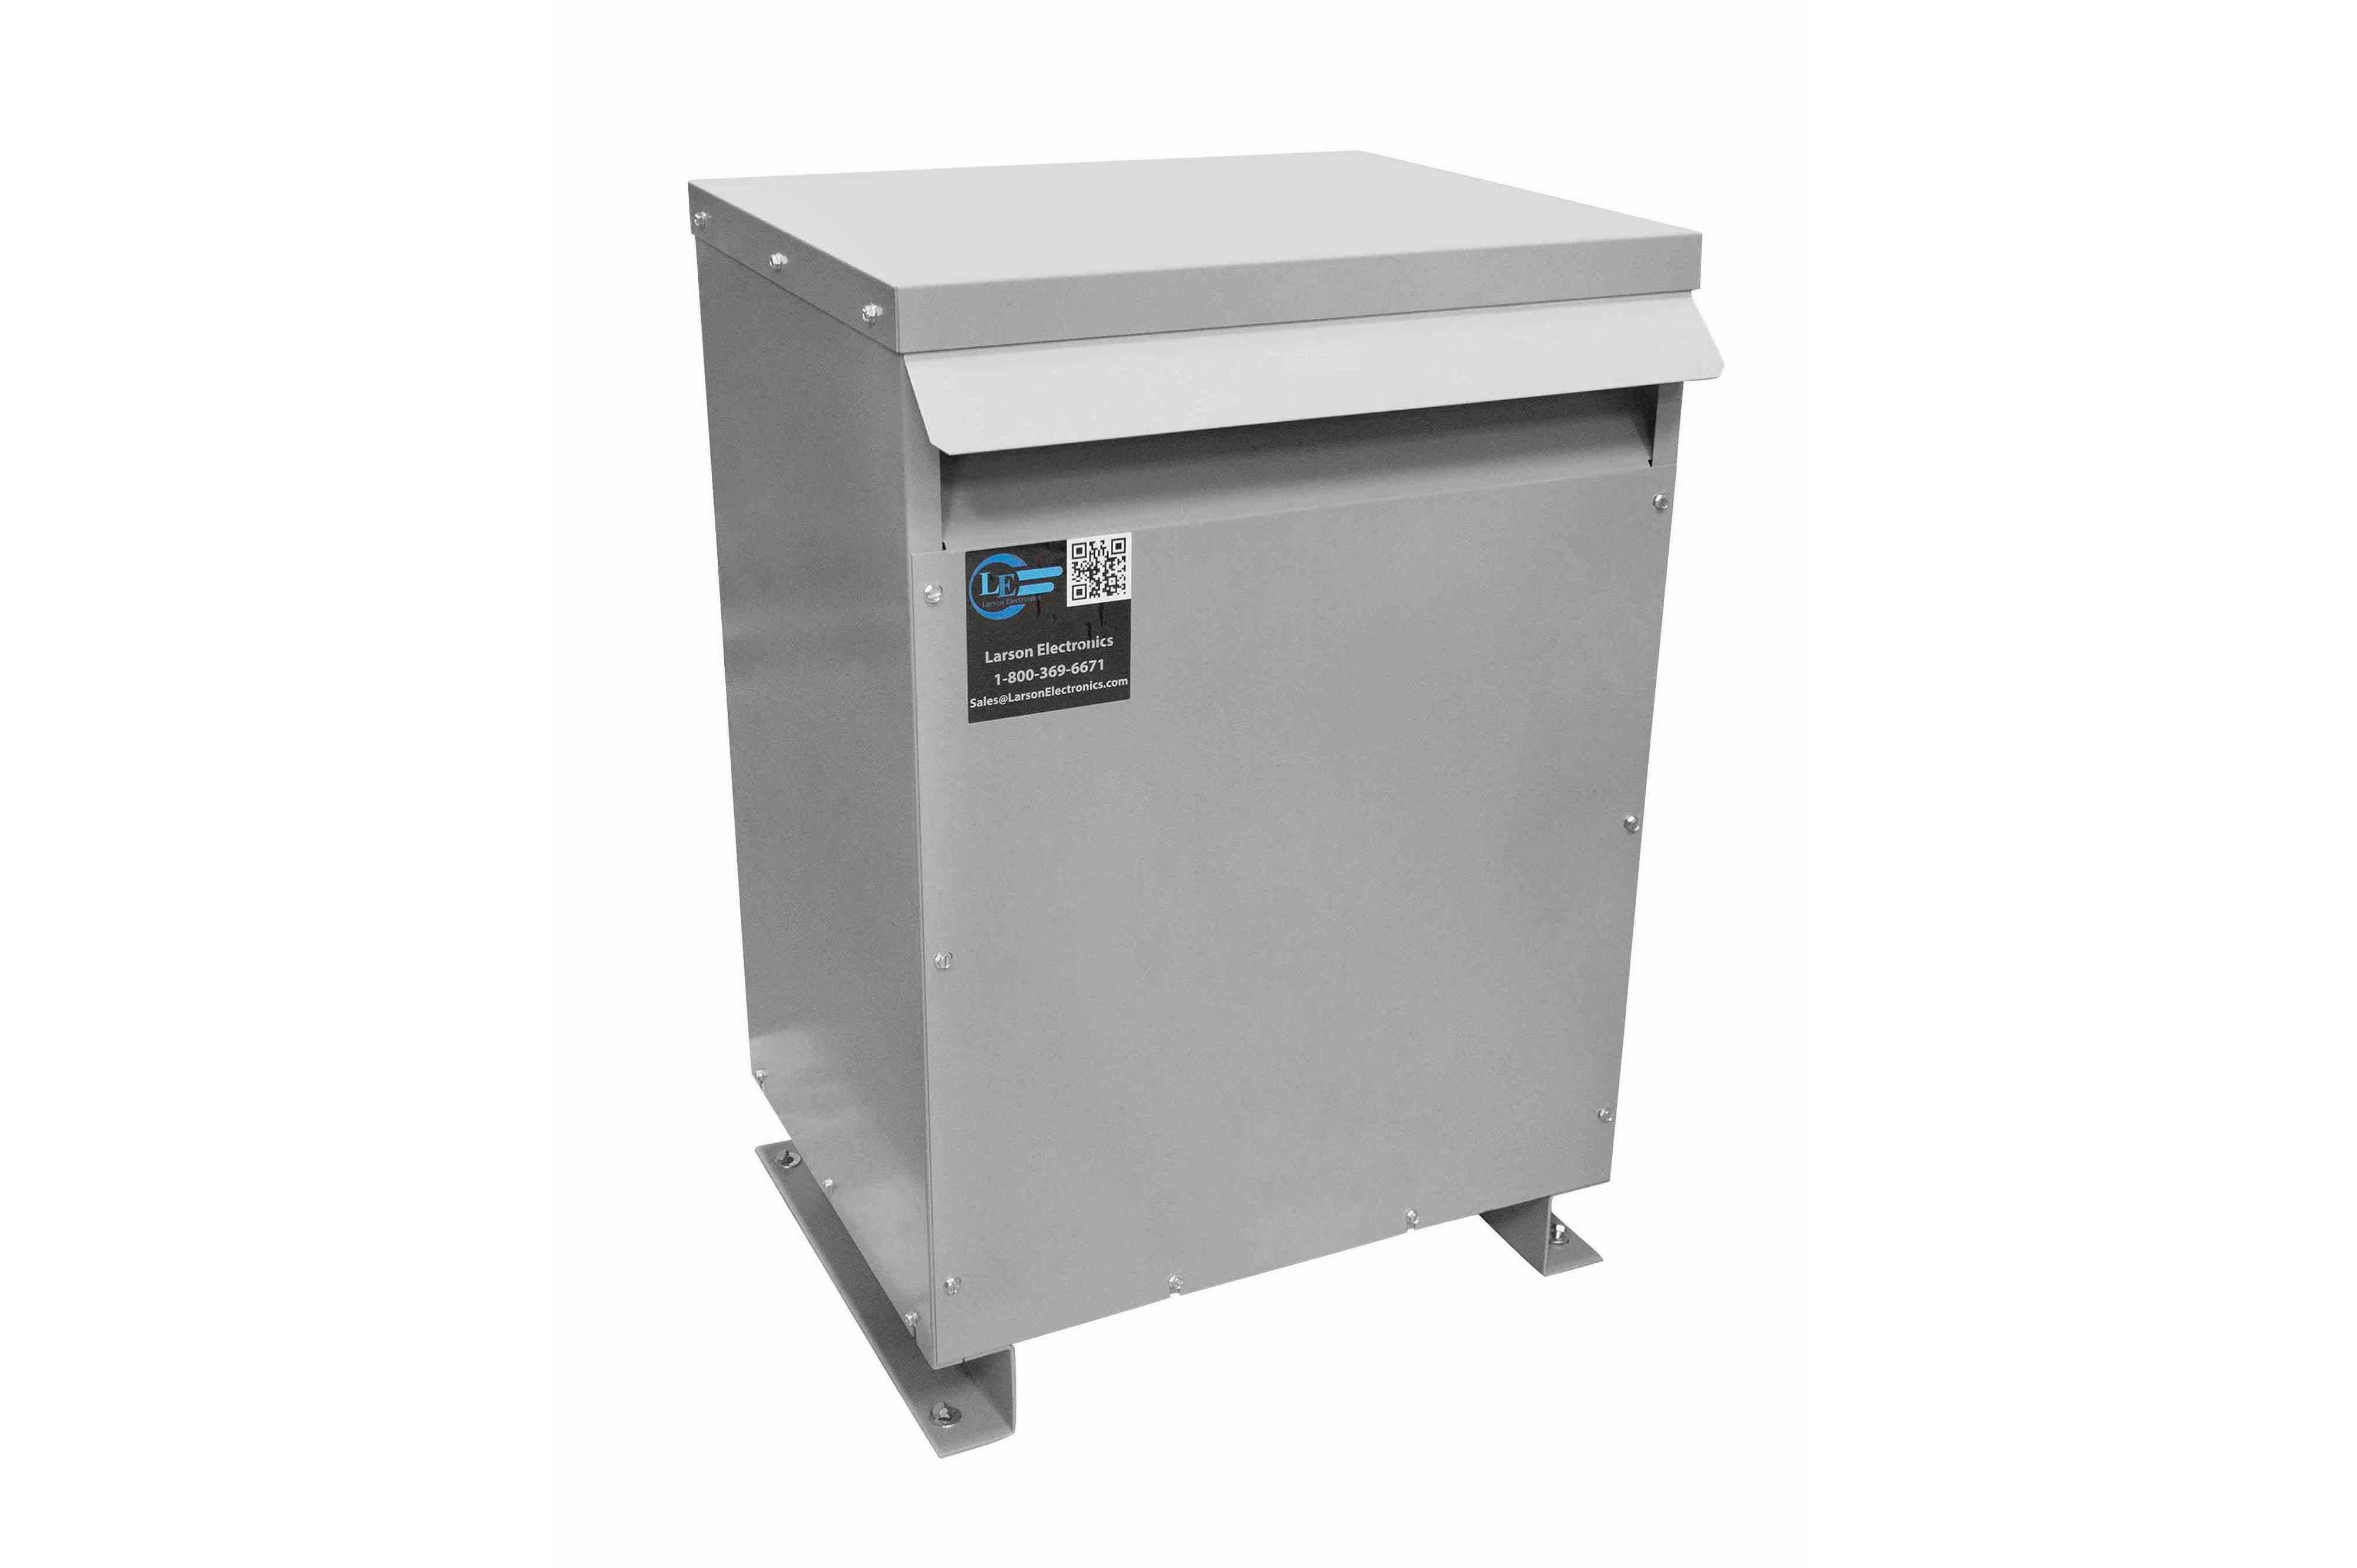 60 kVA 3PH Isolation Transformer, 380V Wye Primary, 208Y/120 Wye-N Secondary, N3R, Ventilated, 60 Hz